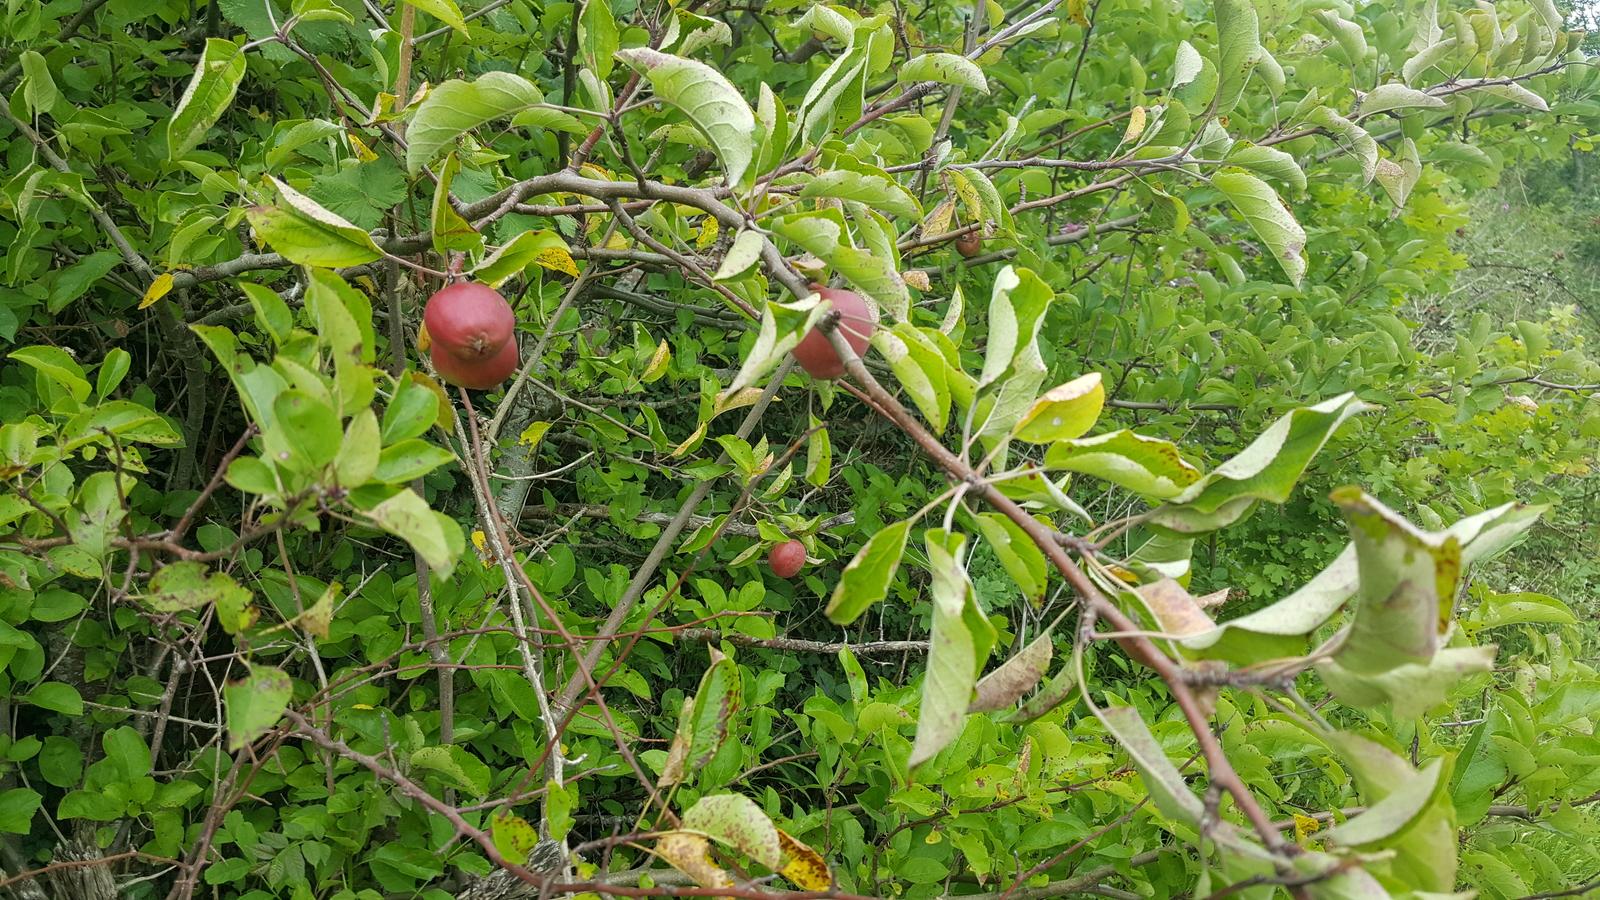 Wild Crab Apple Tree along the Axbridge By-pass A371